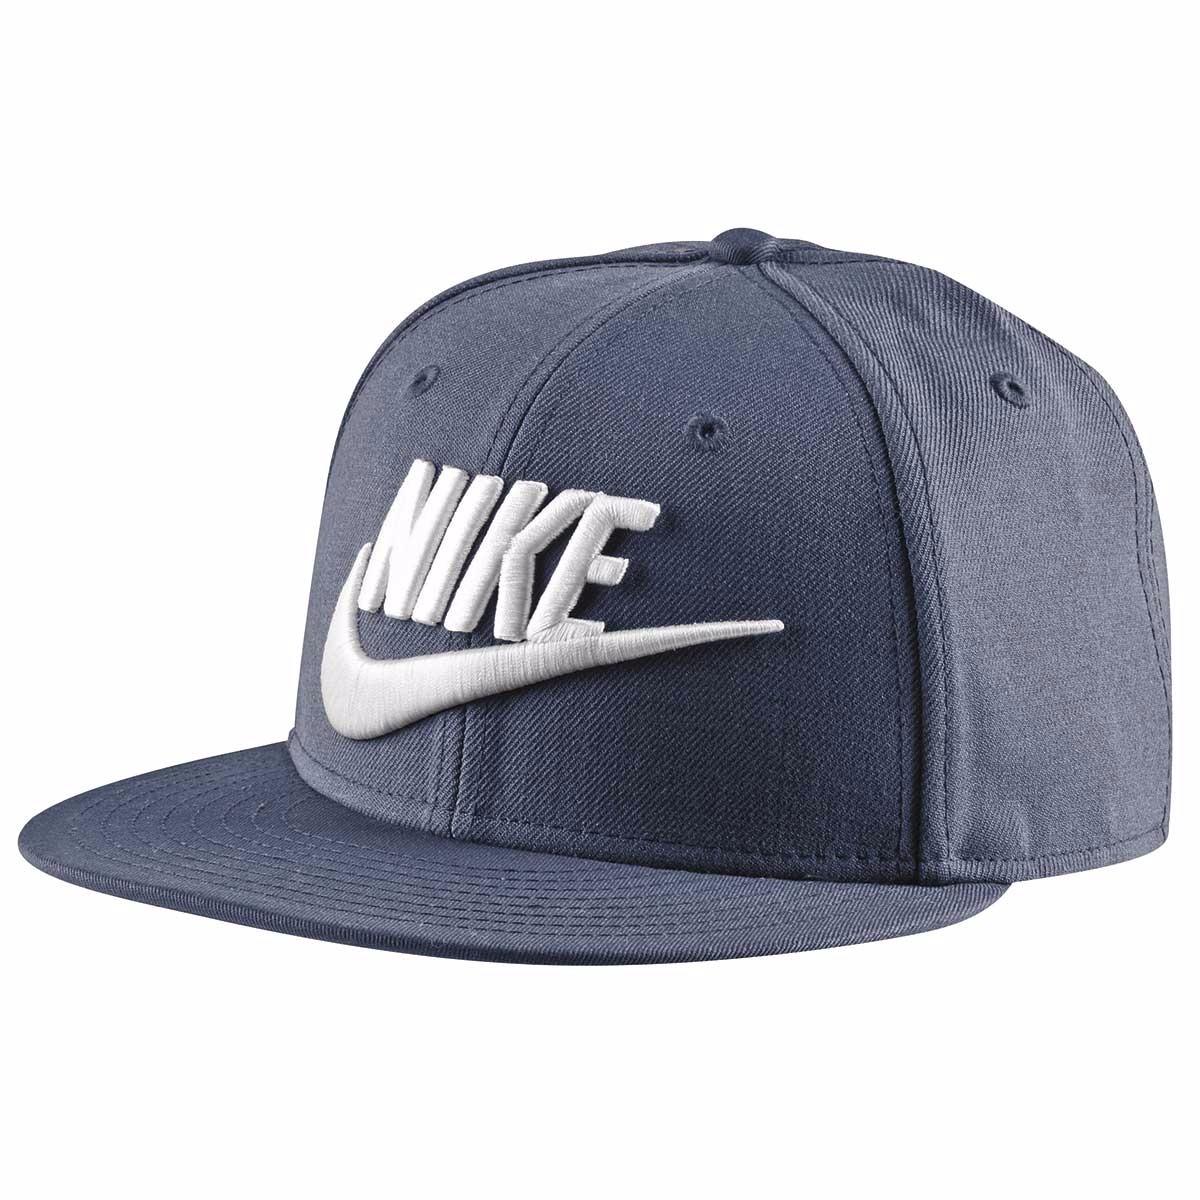 2052caaf33883 Gorra Nike Futura True Varios Colores Oferta! -   999